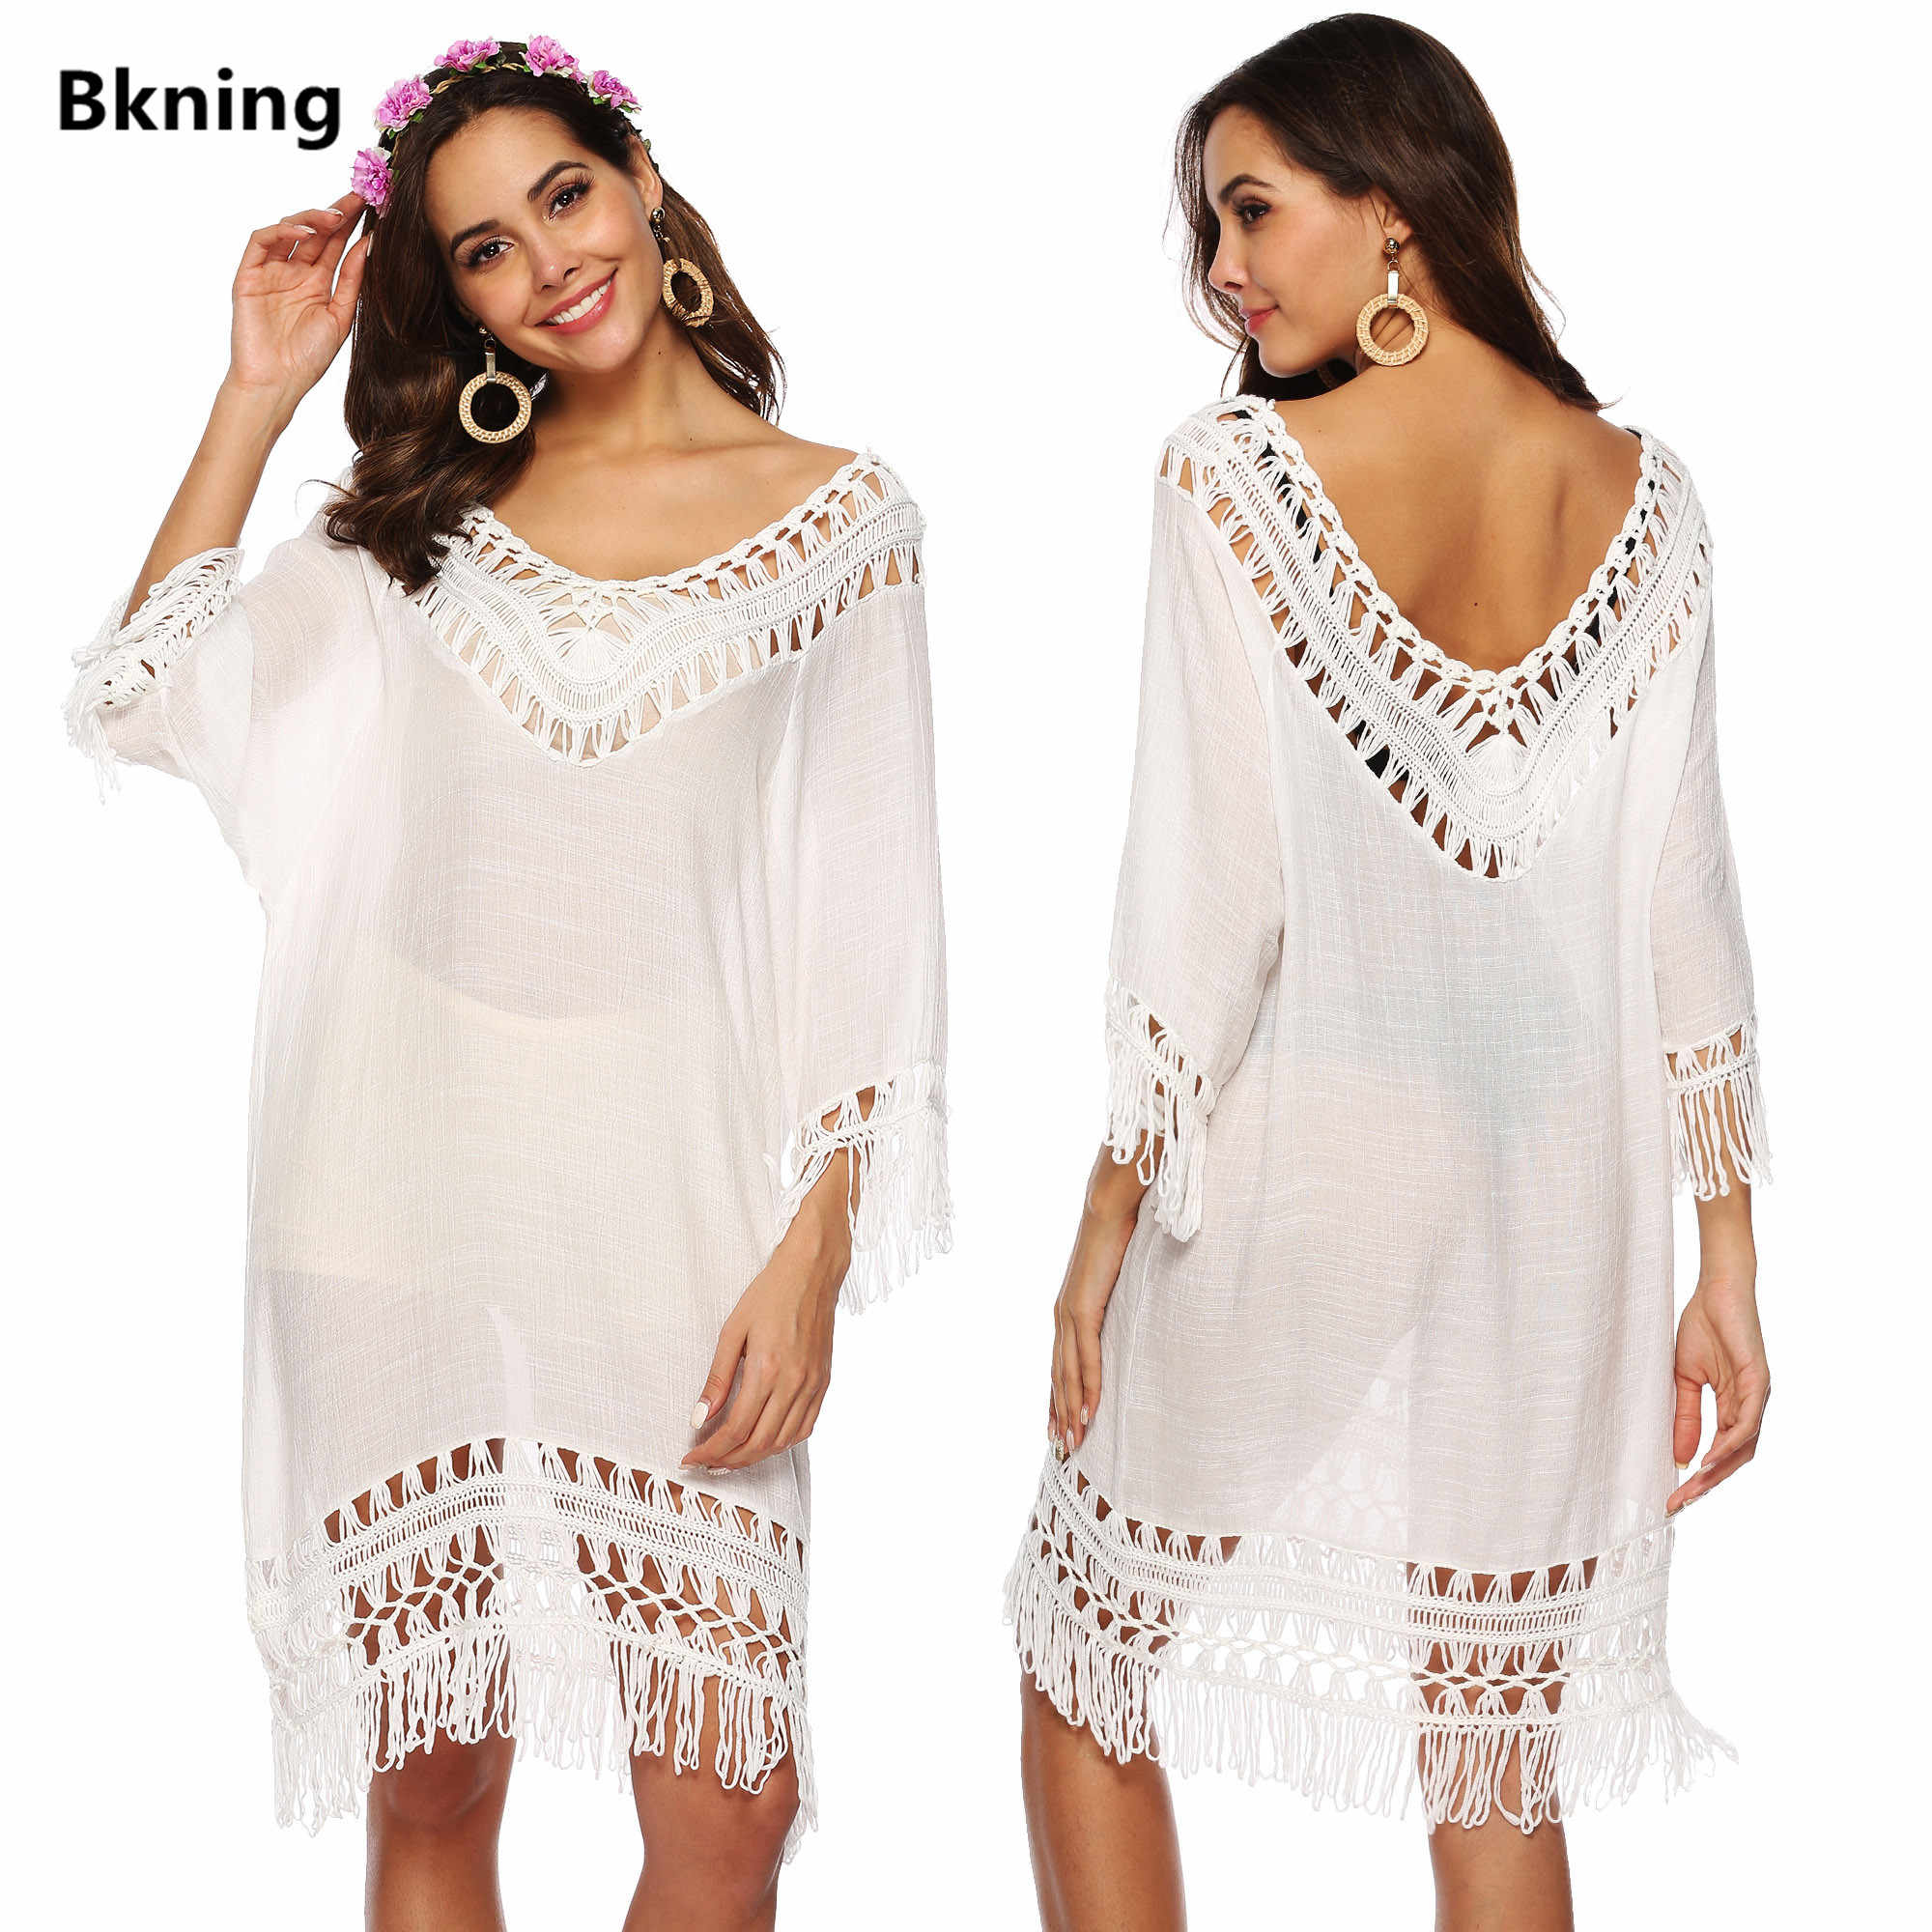 71e62610e0b0 Tassel Beach Dress V Neck White Cover Up Swimsuit Bikini Tunic Ups Women  Dresses Bathing Suit